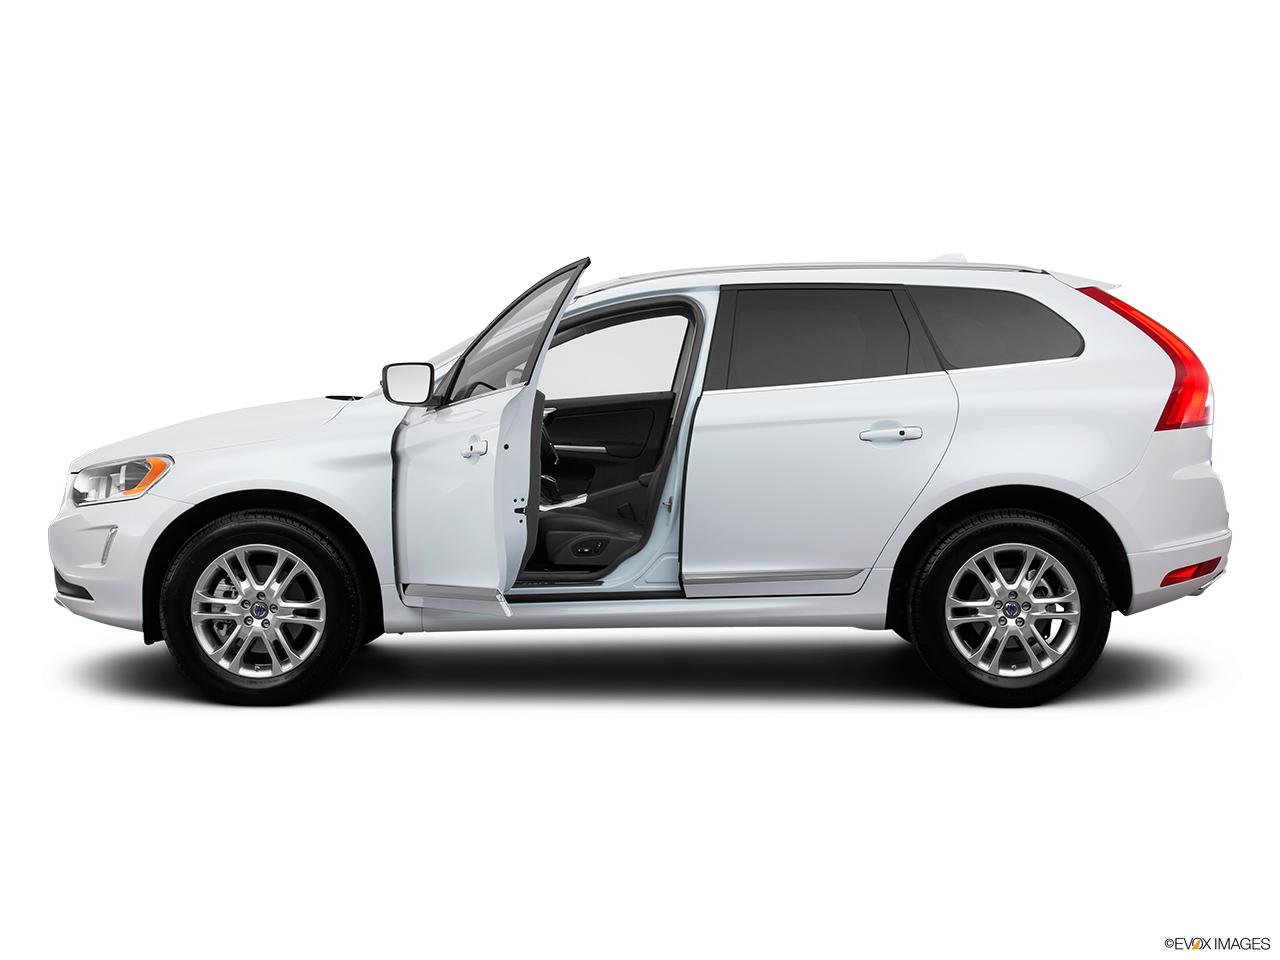 Volvo Xc 60 T6 >> 2015 Volvo XC60 AWD 4 Door T6 - Driver's side profile with drivers side door open